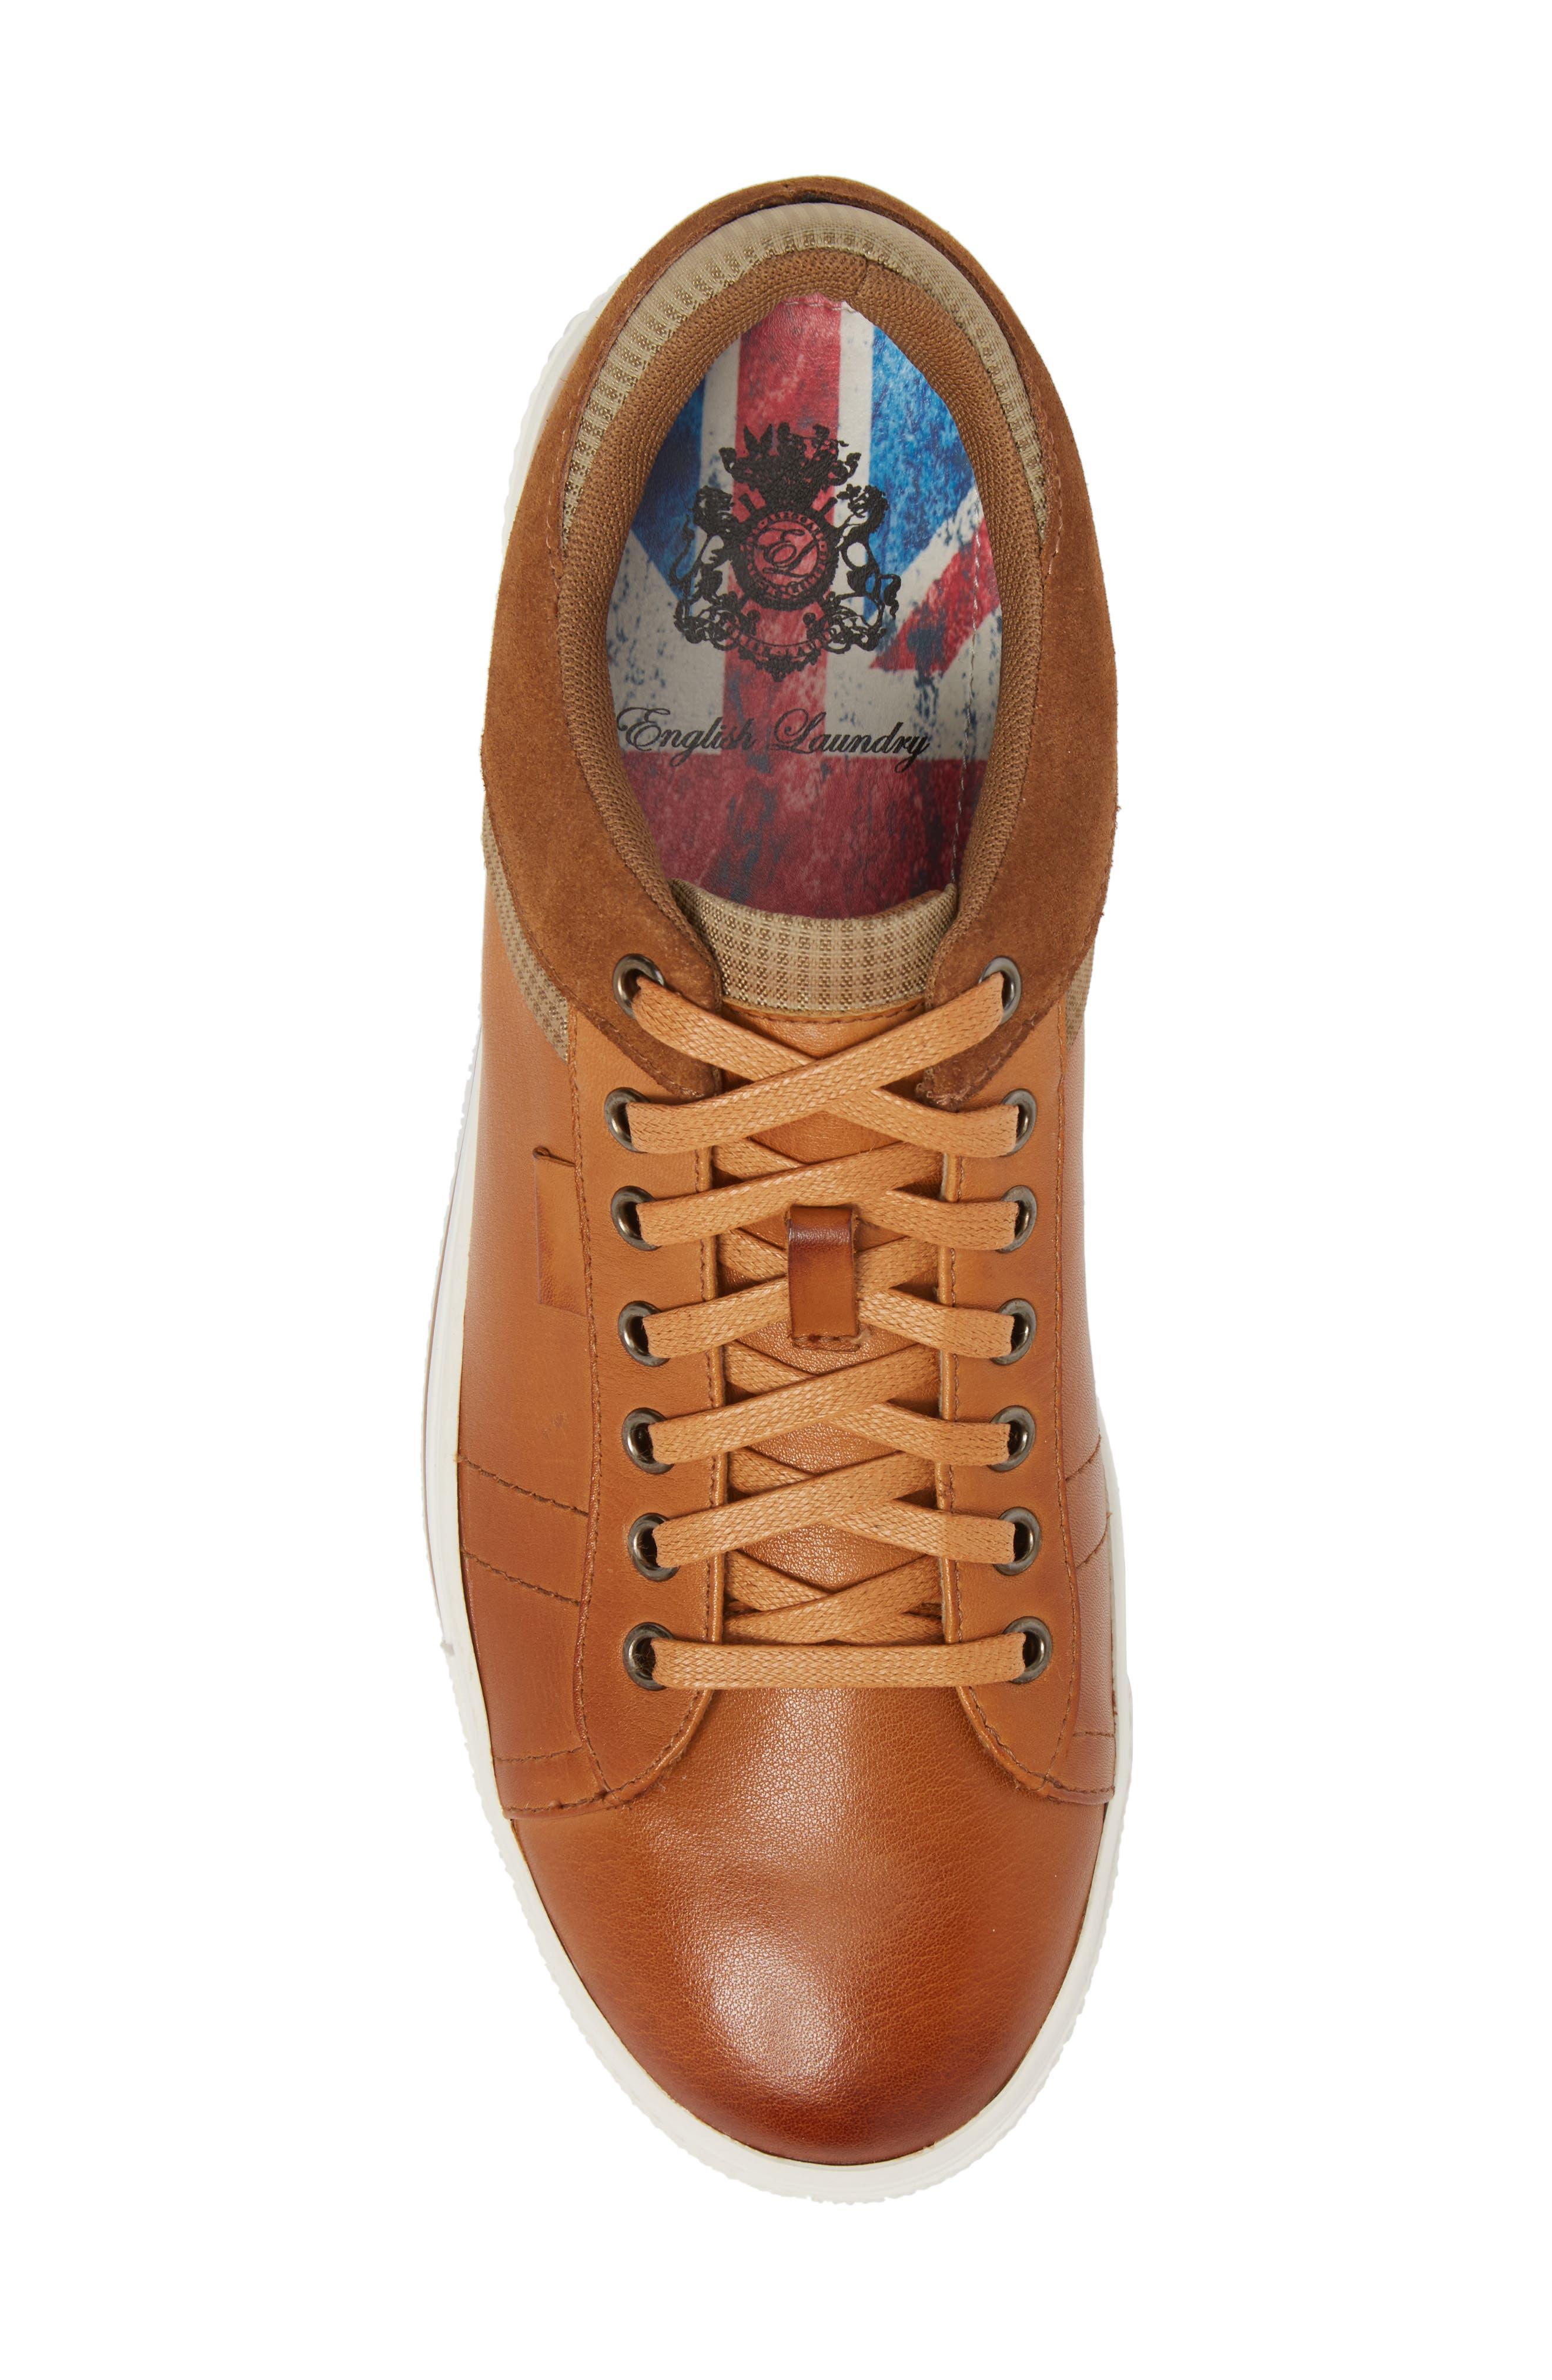 Ireton Low Top Sneaker,                             Alternate thumbnail 5, color,                             Cognac Leather/ Suede